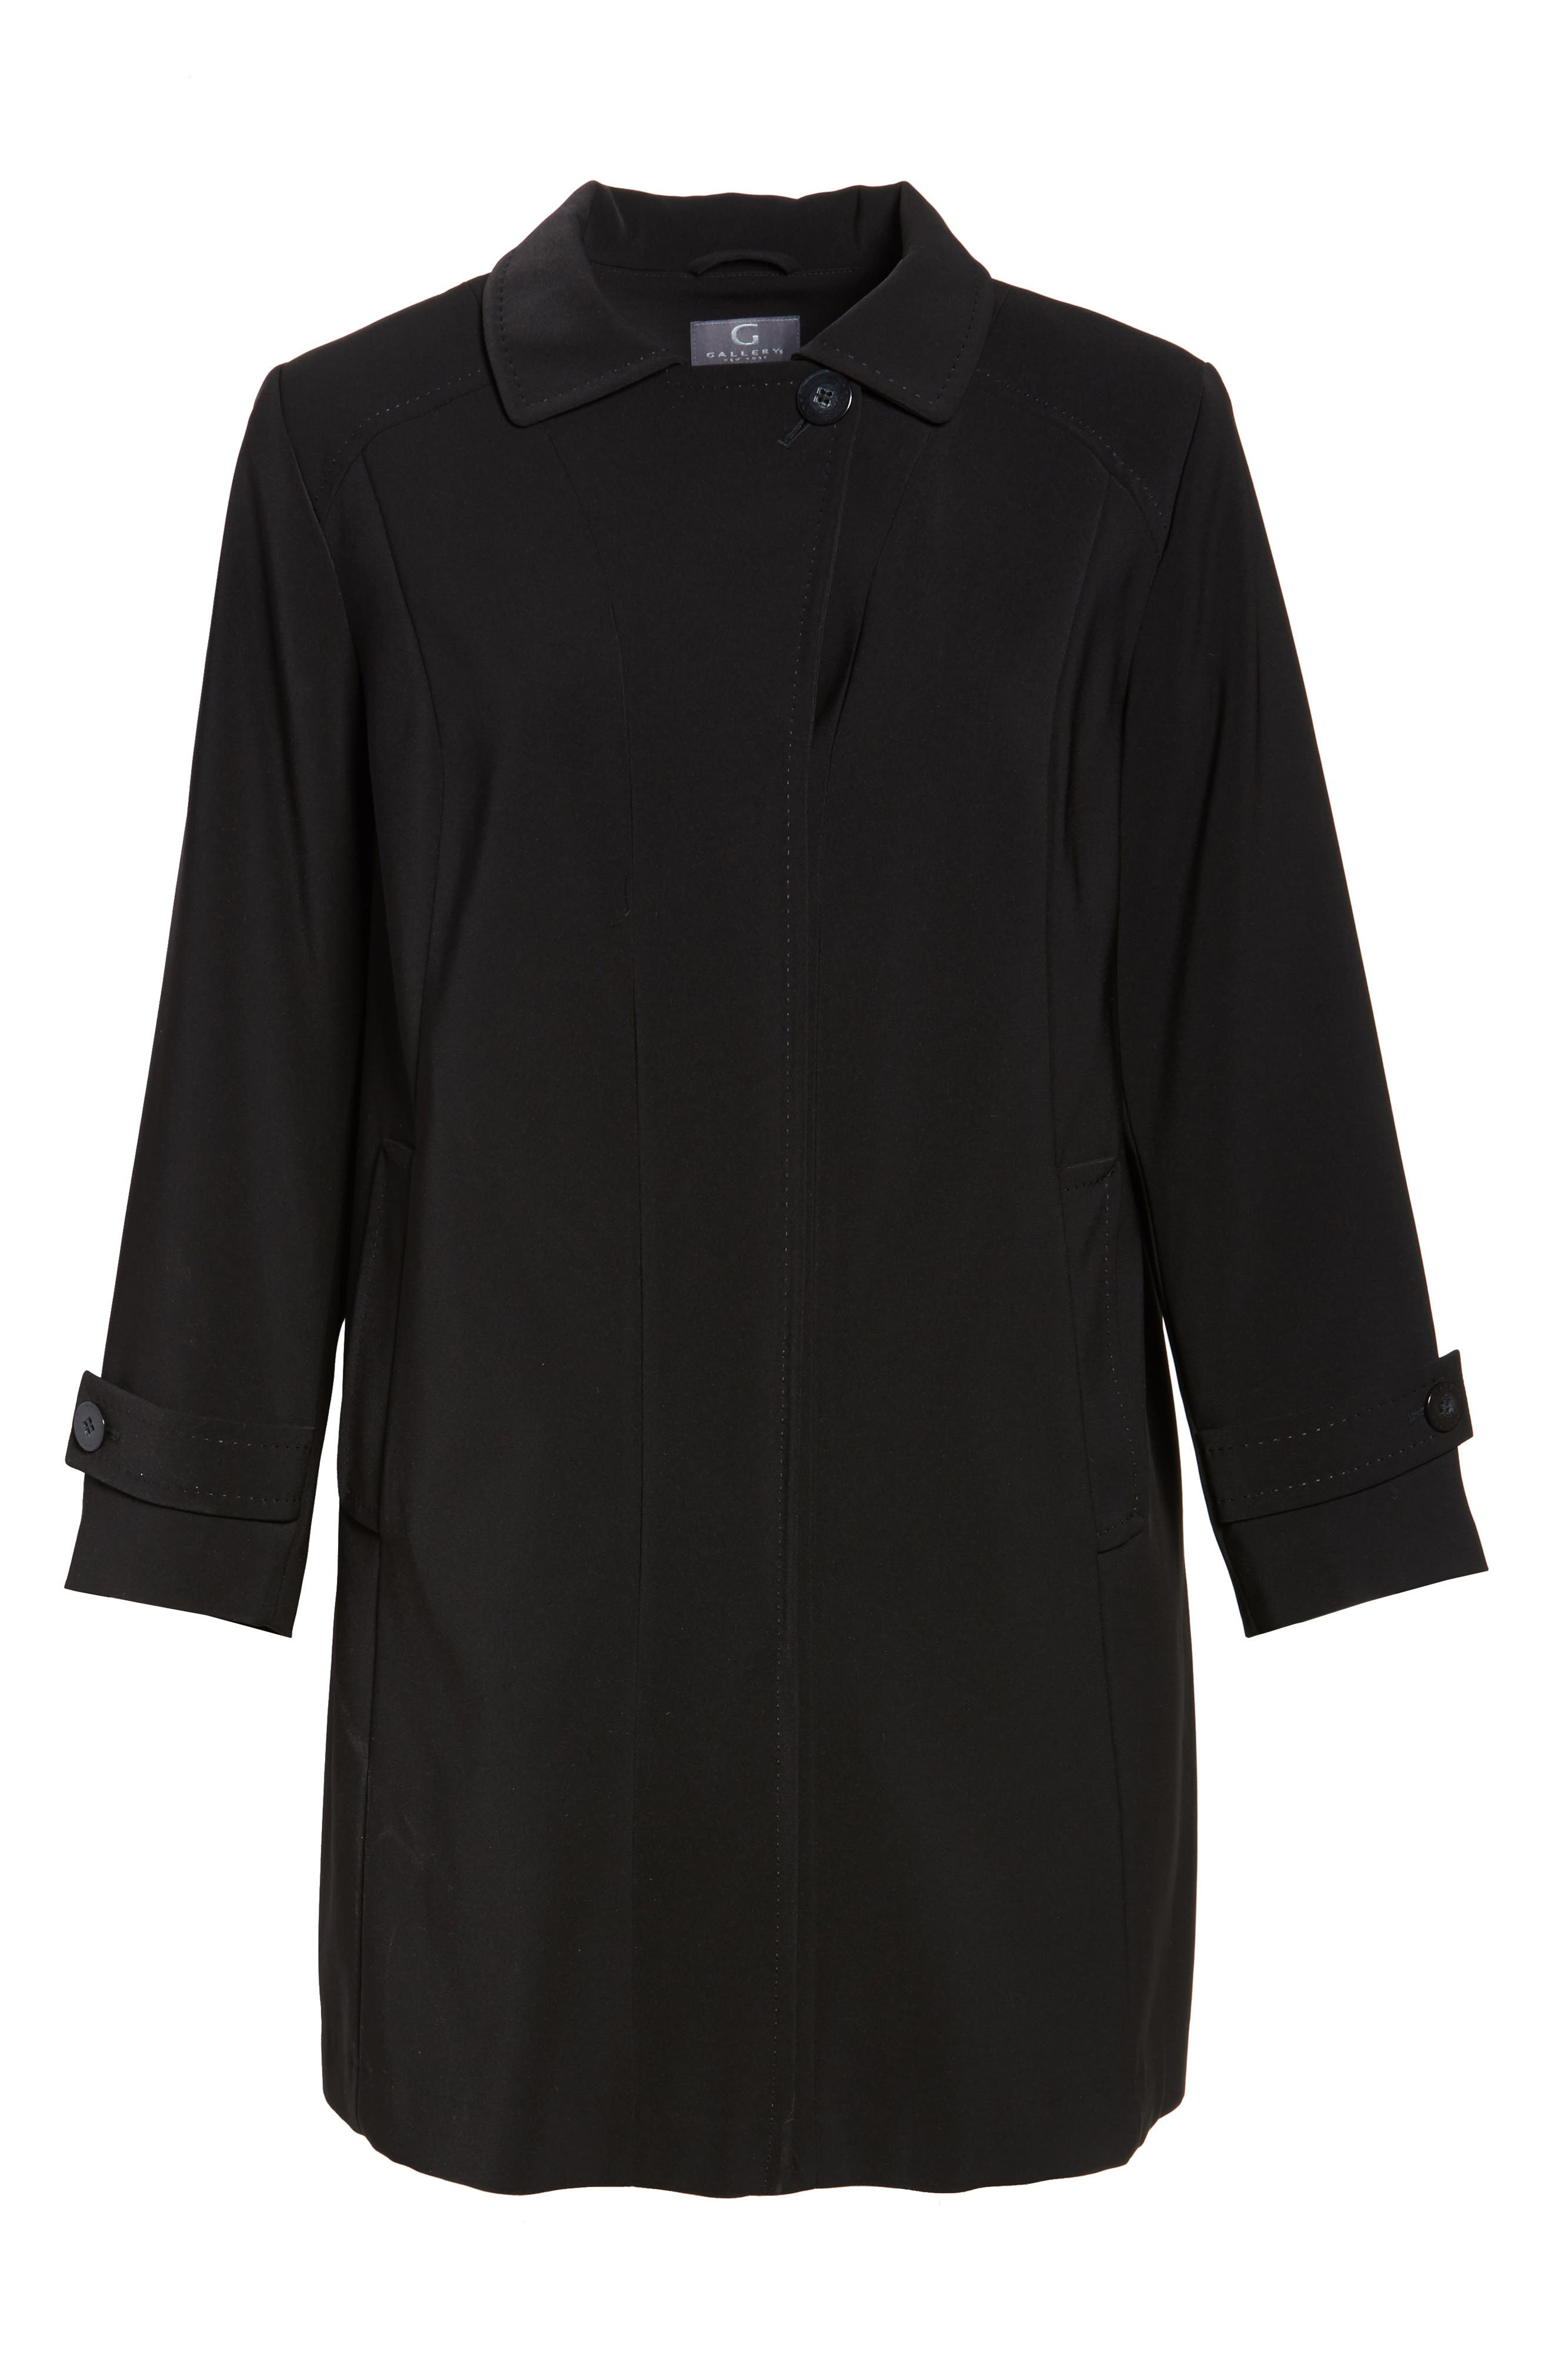 A-Line Raincoat with Detachable Hood & Liner,                             Alternate thumbnail 5, color,                             001